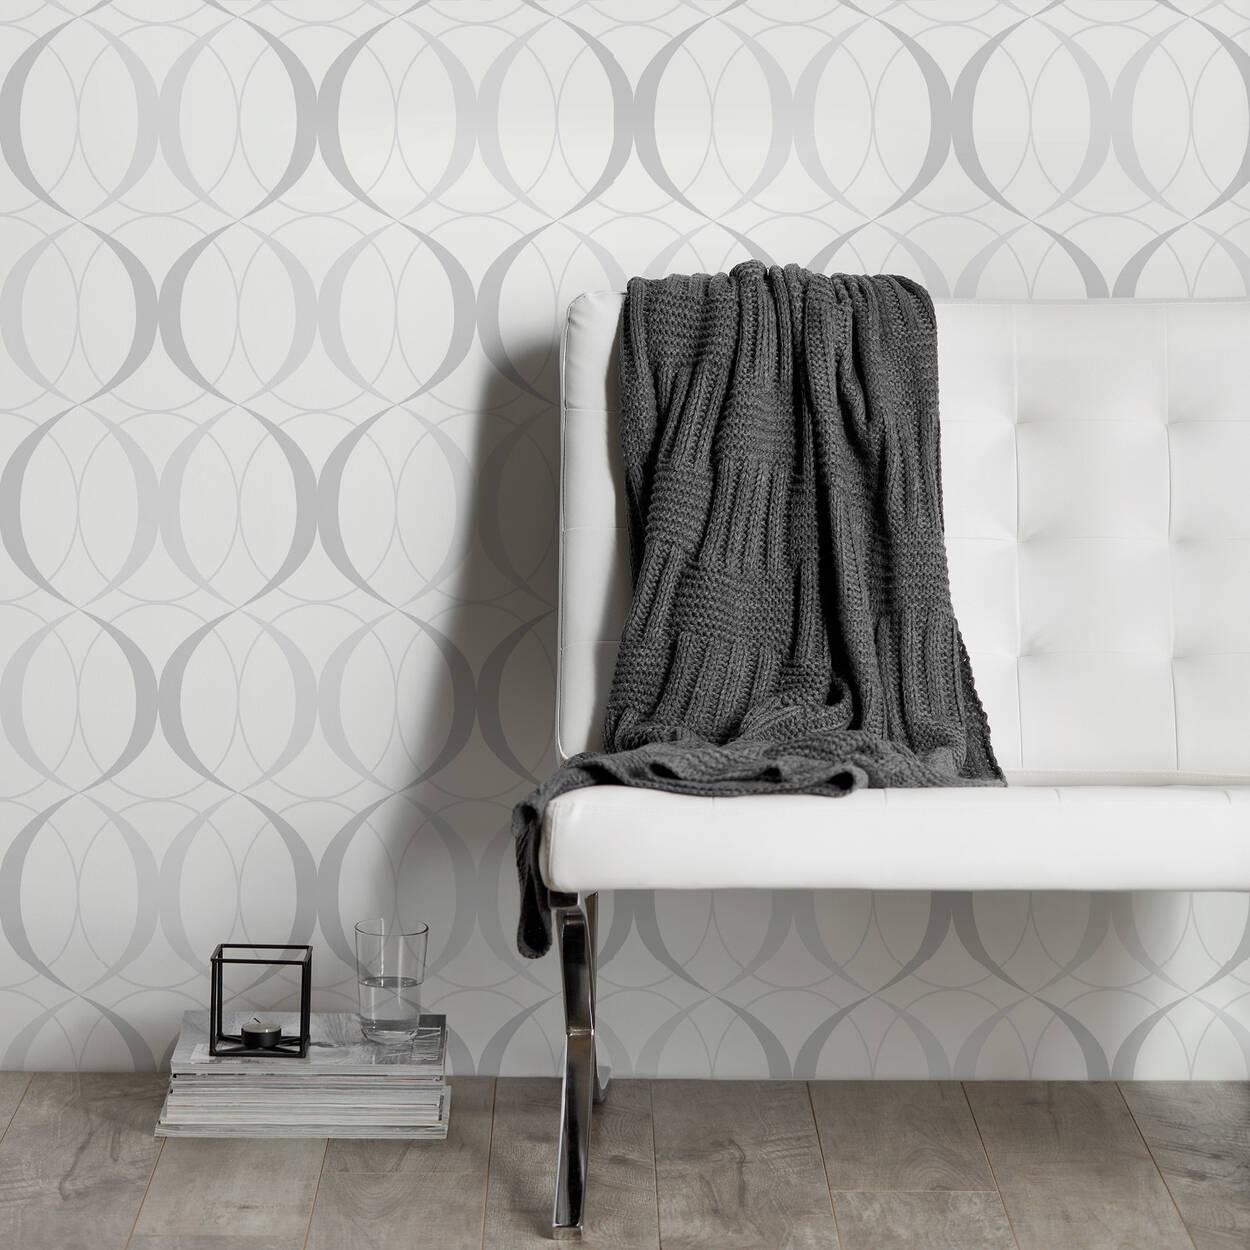 Circular Wallpaper - Double Roll